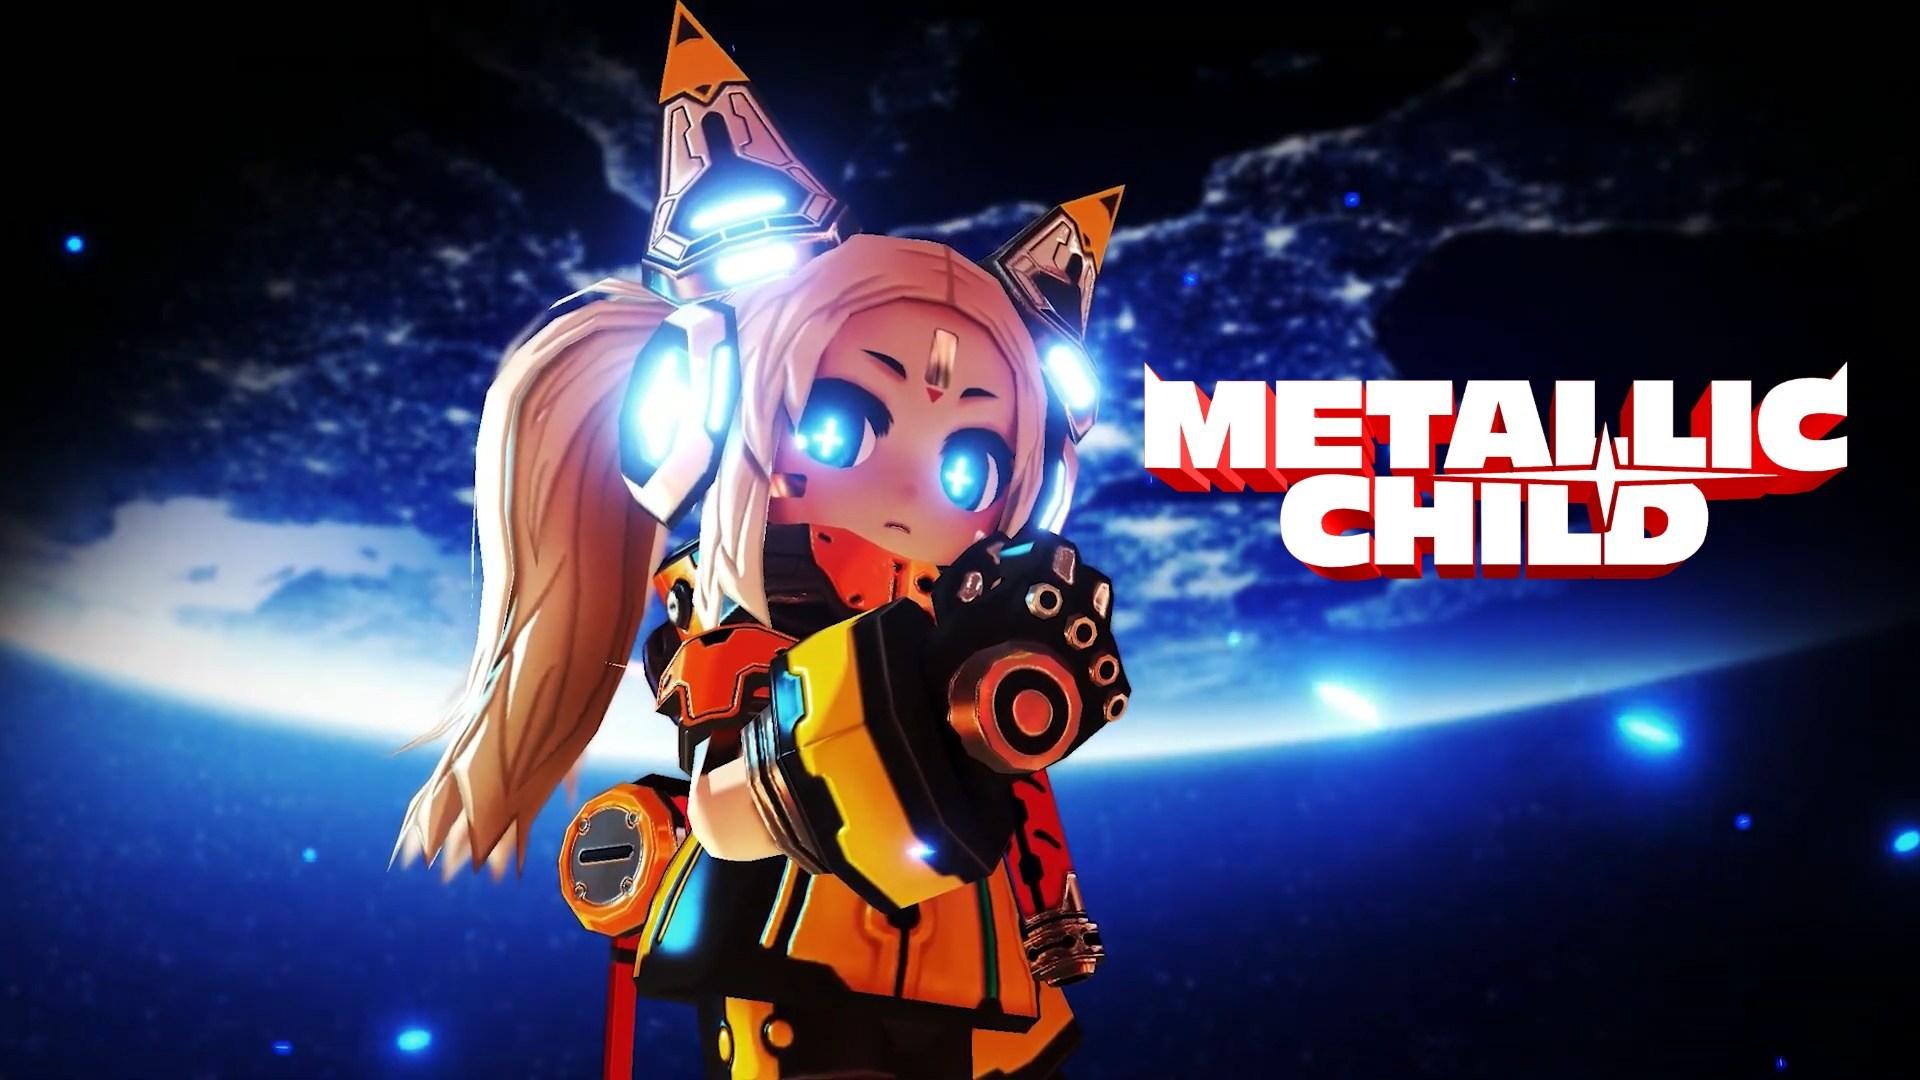 Metallic Child 2392020 1